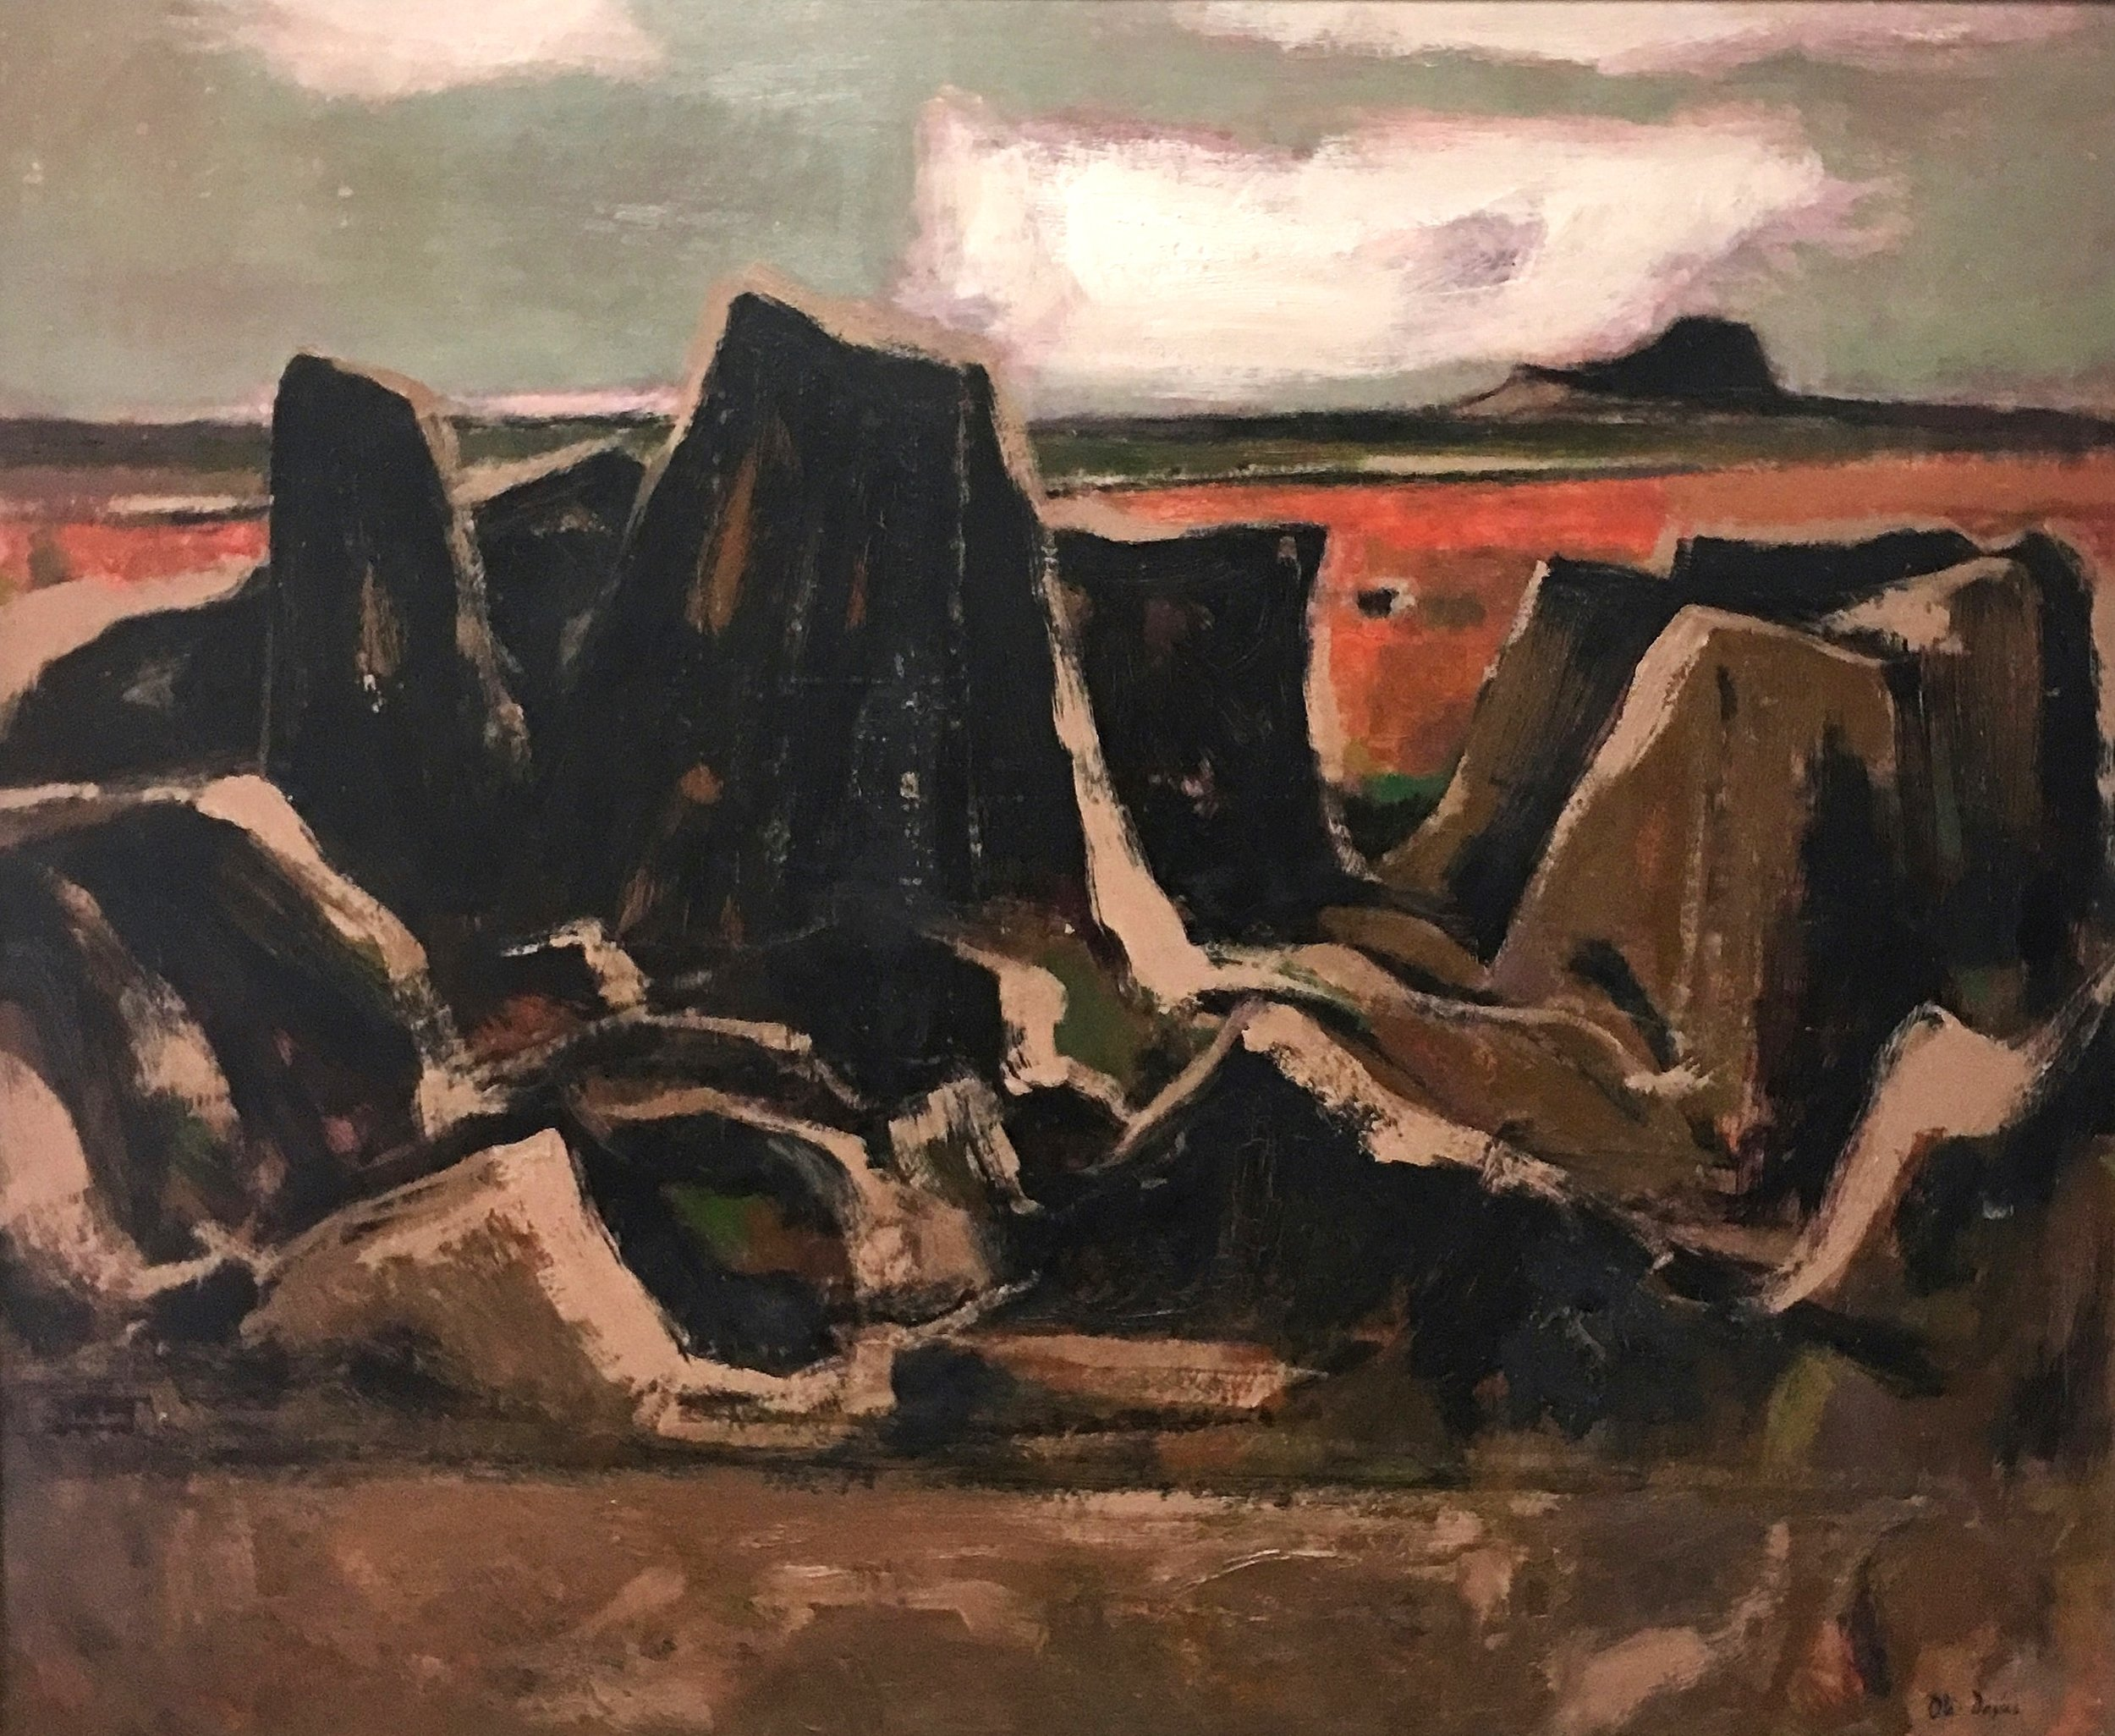 Otis Dozier, Angry Earth, 1965, oil on Masonite